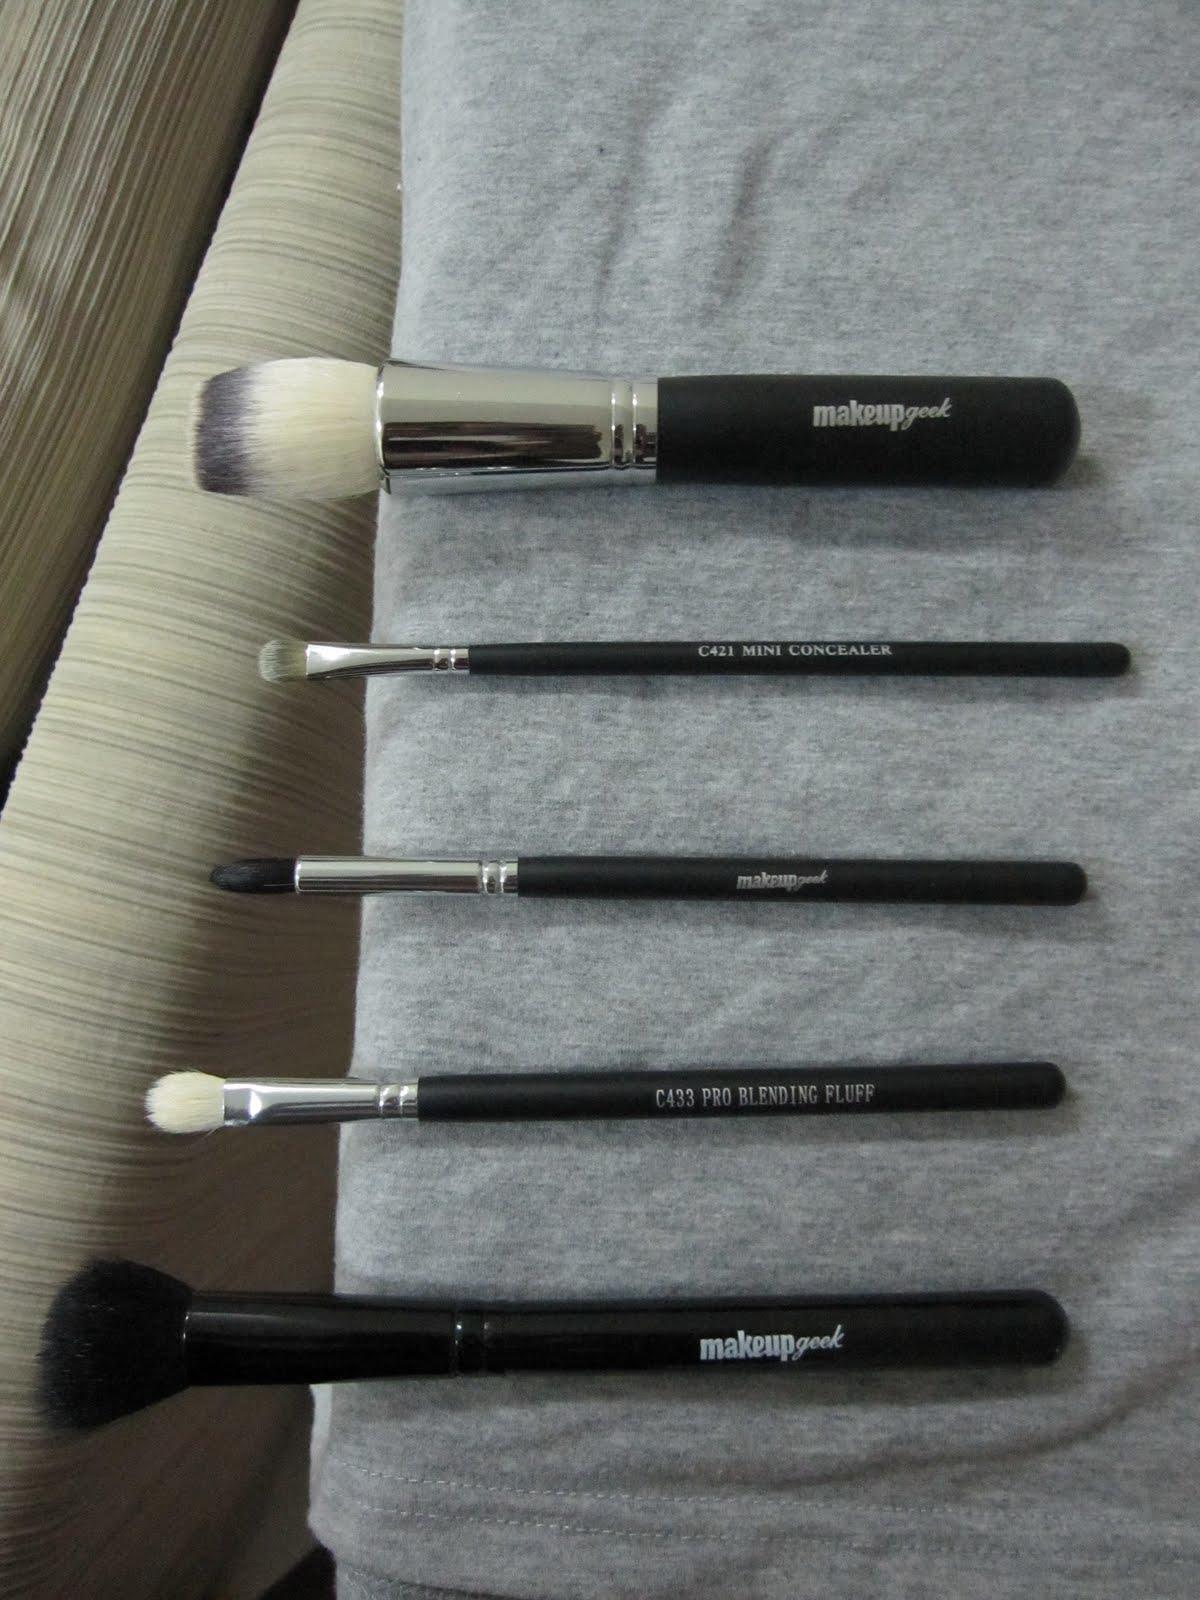 Makeup Geek Brushes Makeup Geek Brushes Bought